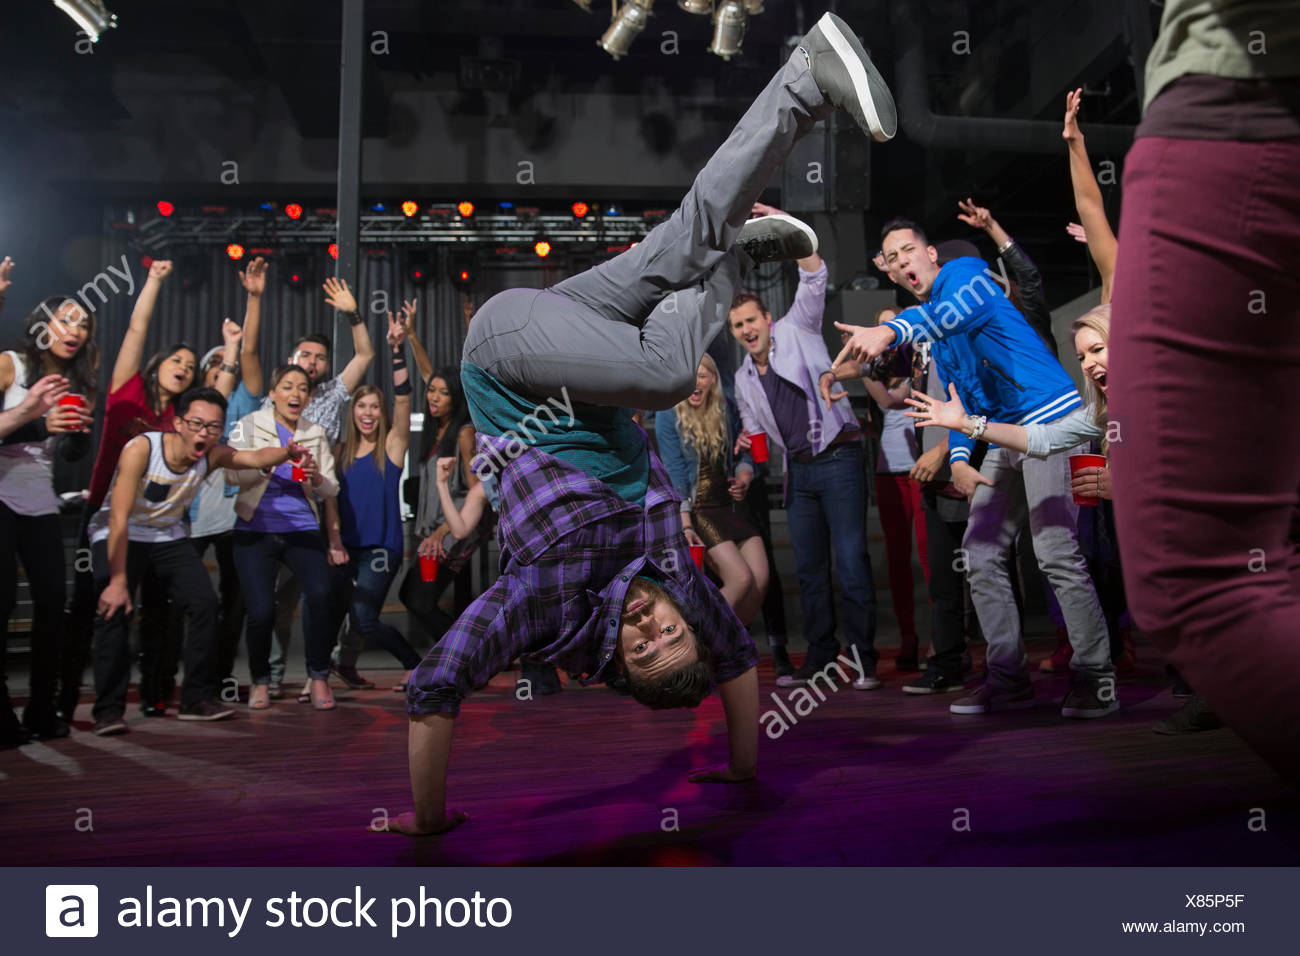 Crowd watching and cheering break dancer - Stock Image